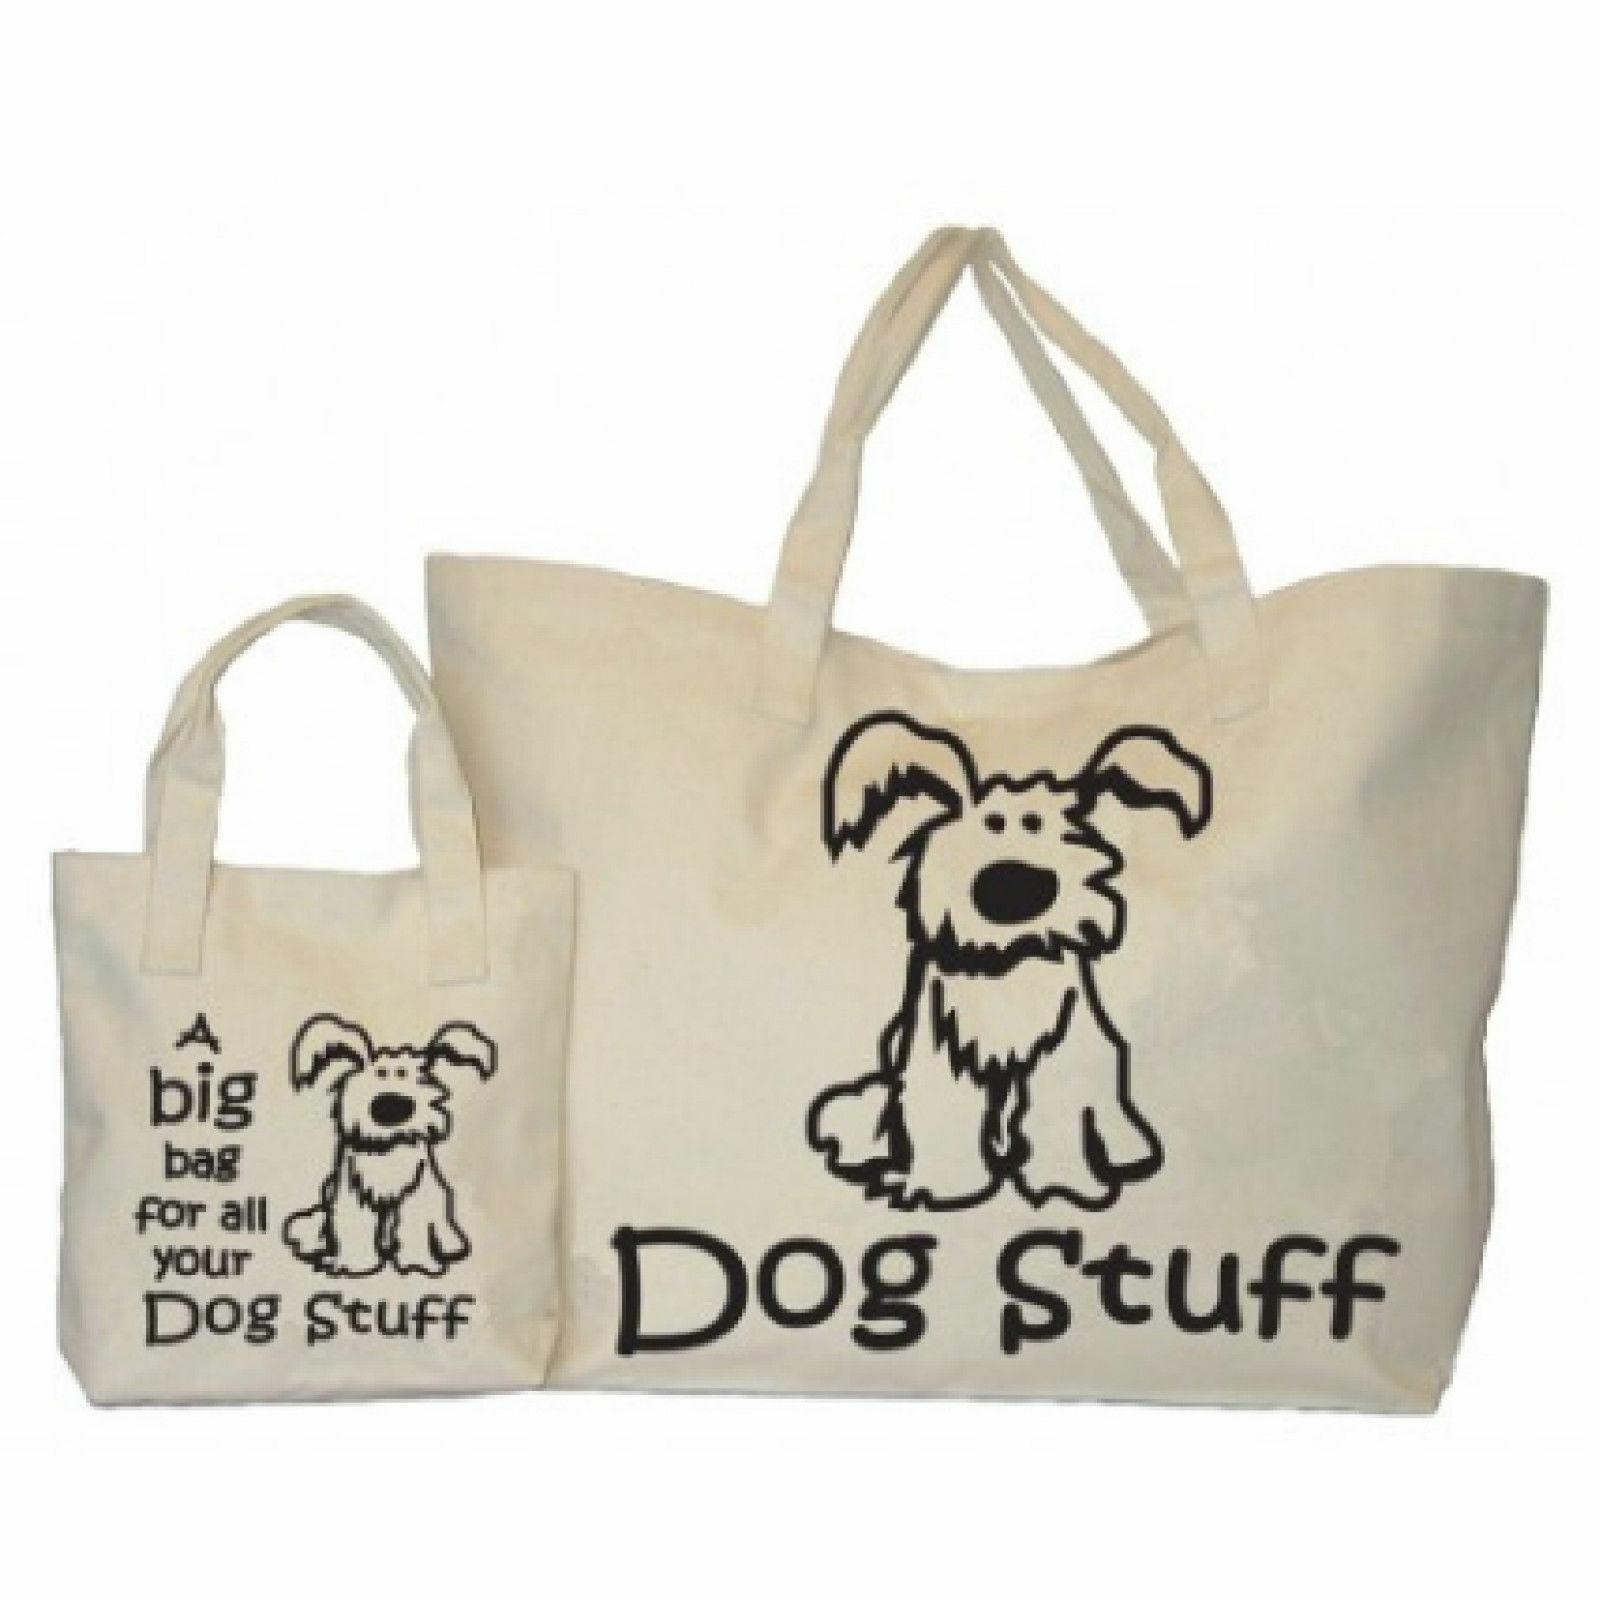 Moorland Rider Dog Stuff Big Bag  Folds Flat Great For Pet Gear